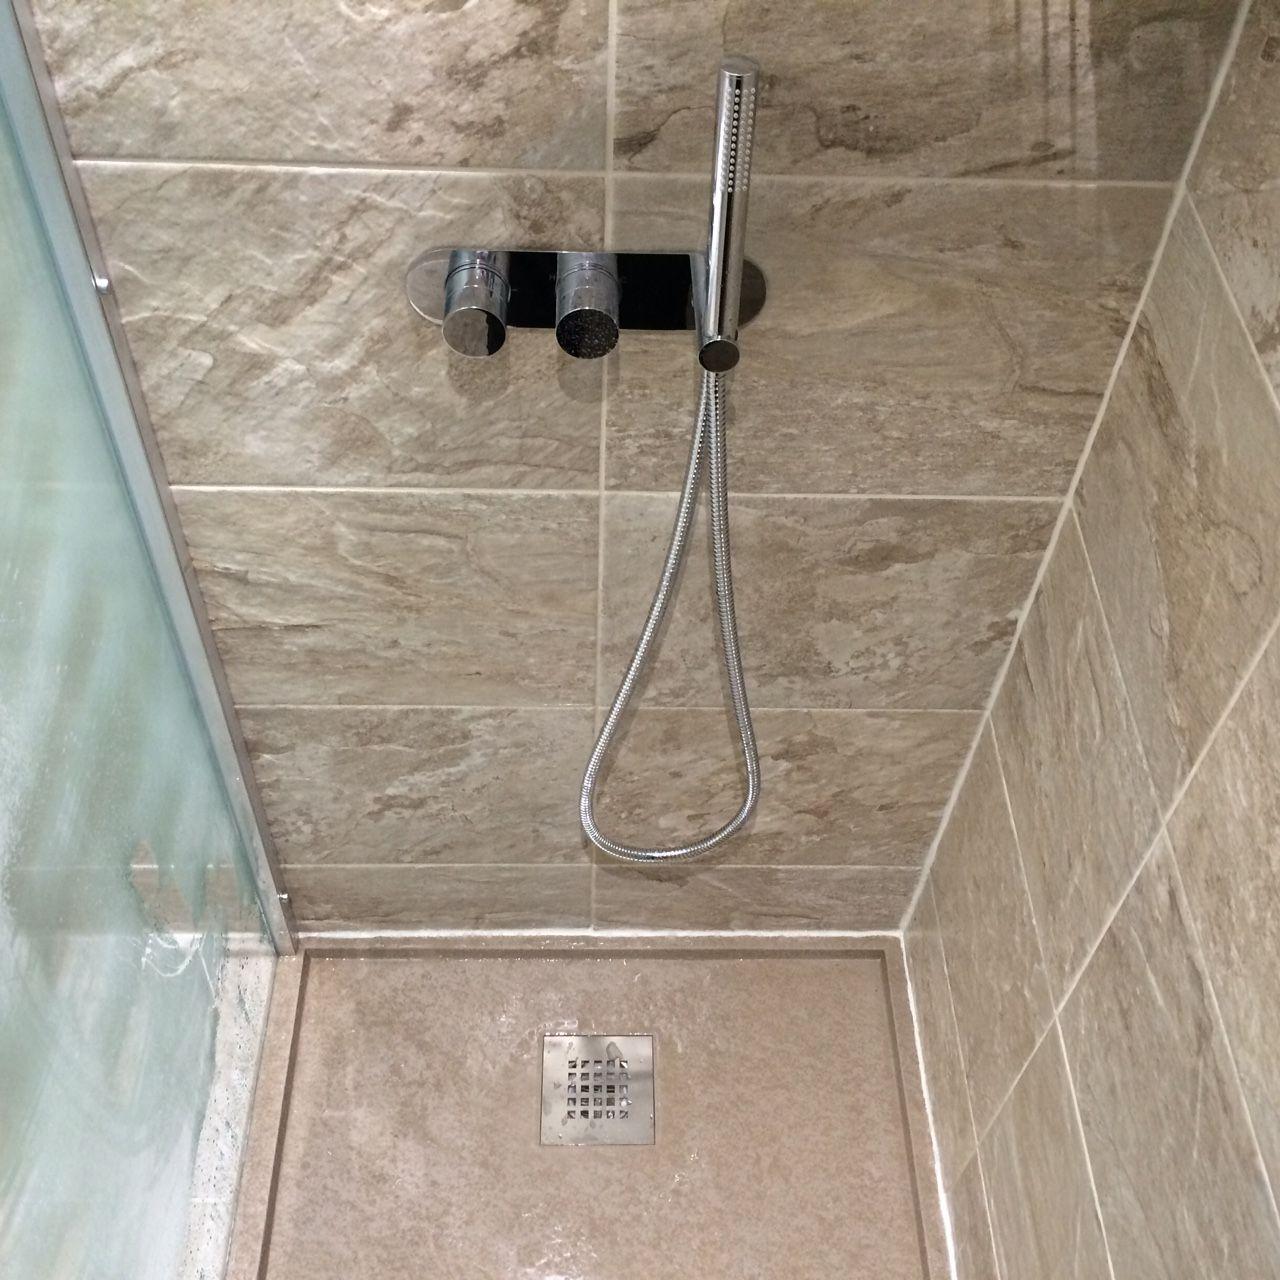 Shower Tray Fiora, Silex Tray, Cappucino. Shower Valve